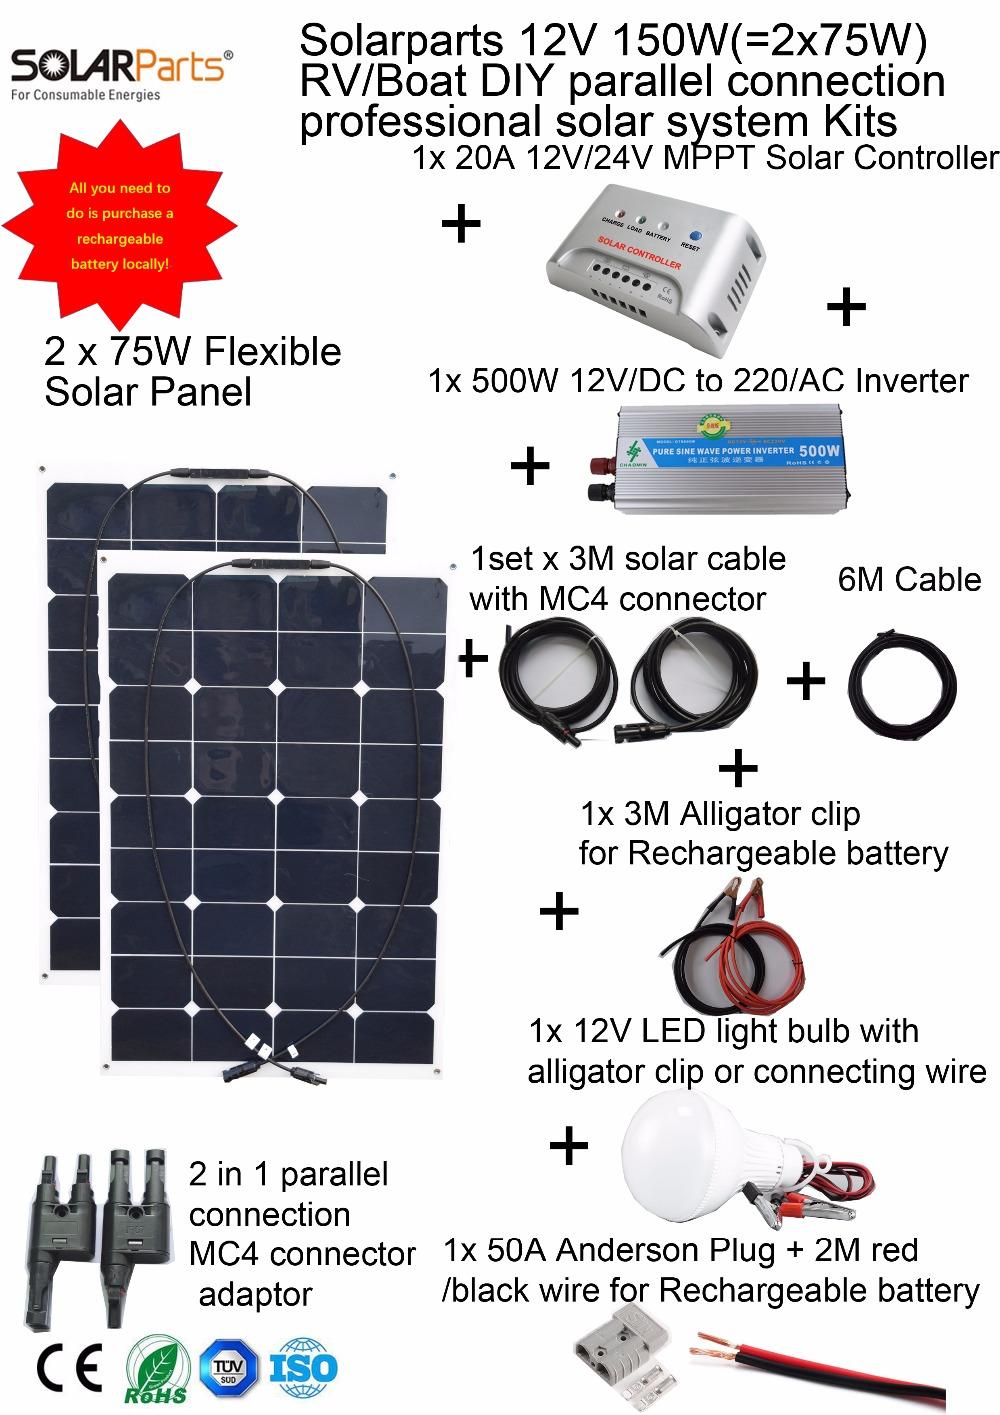 Solarparts 1x150W Professional DIY RV/Boat/Marine Kits Solar Home System 2x75W flexible solar panel MPPT controller Inverter LED(China (Mainland))